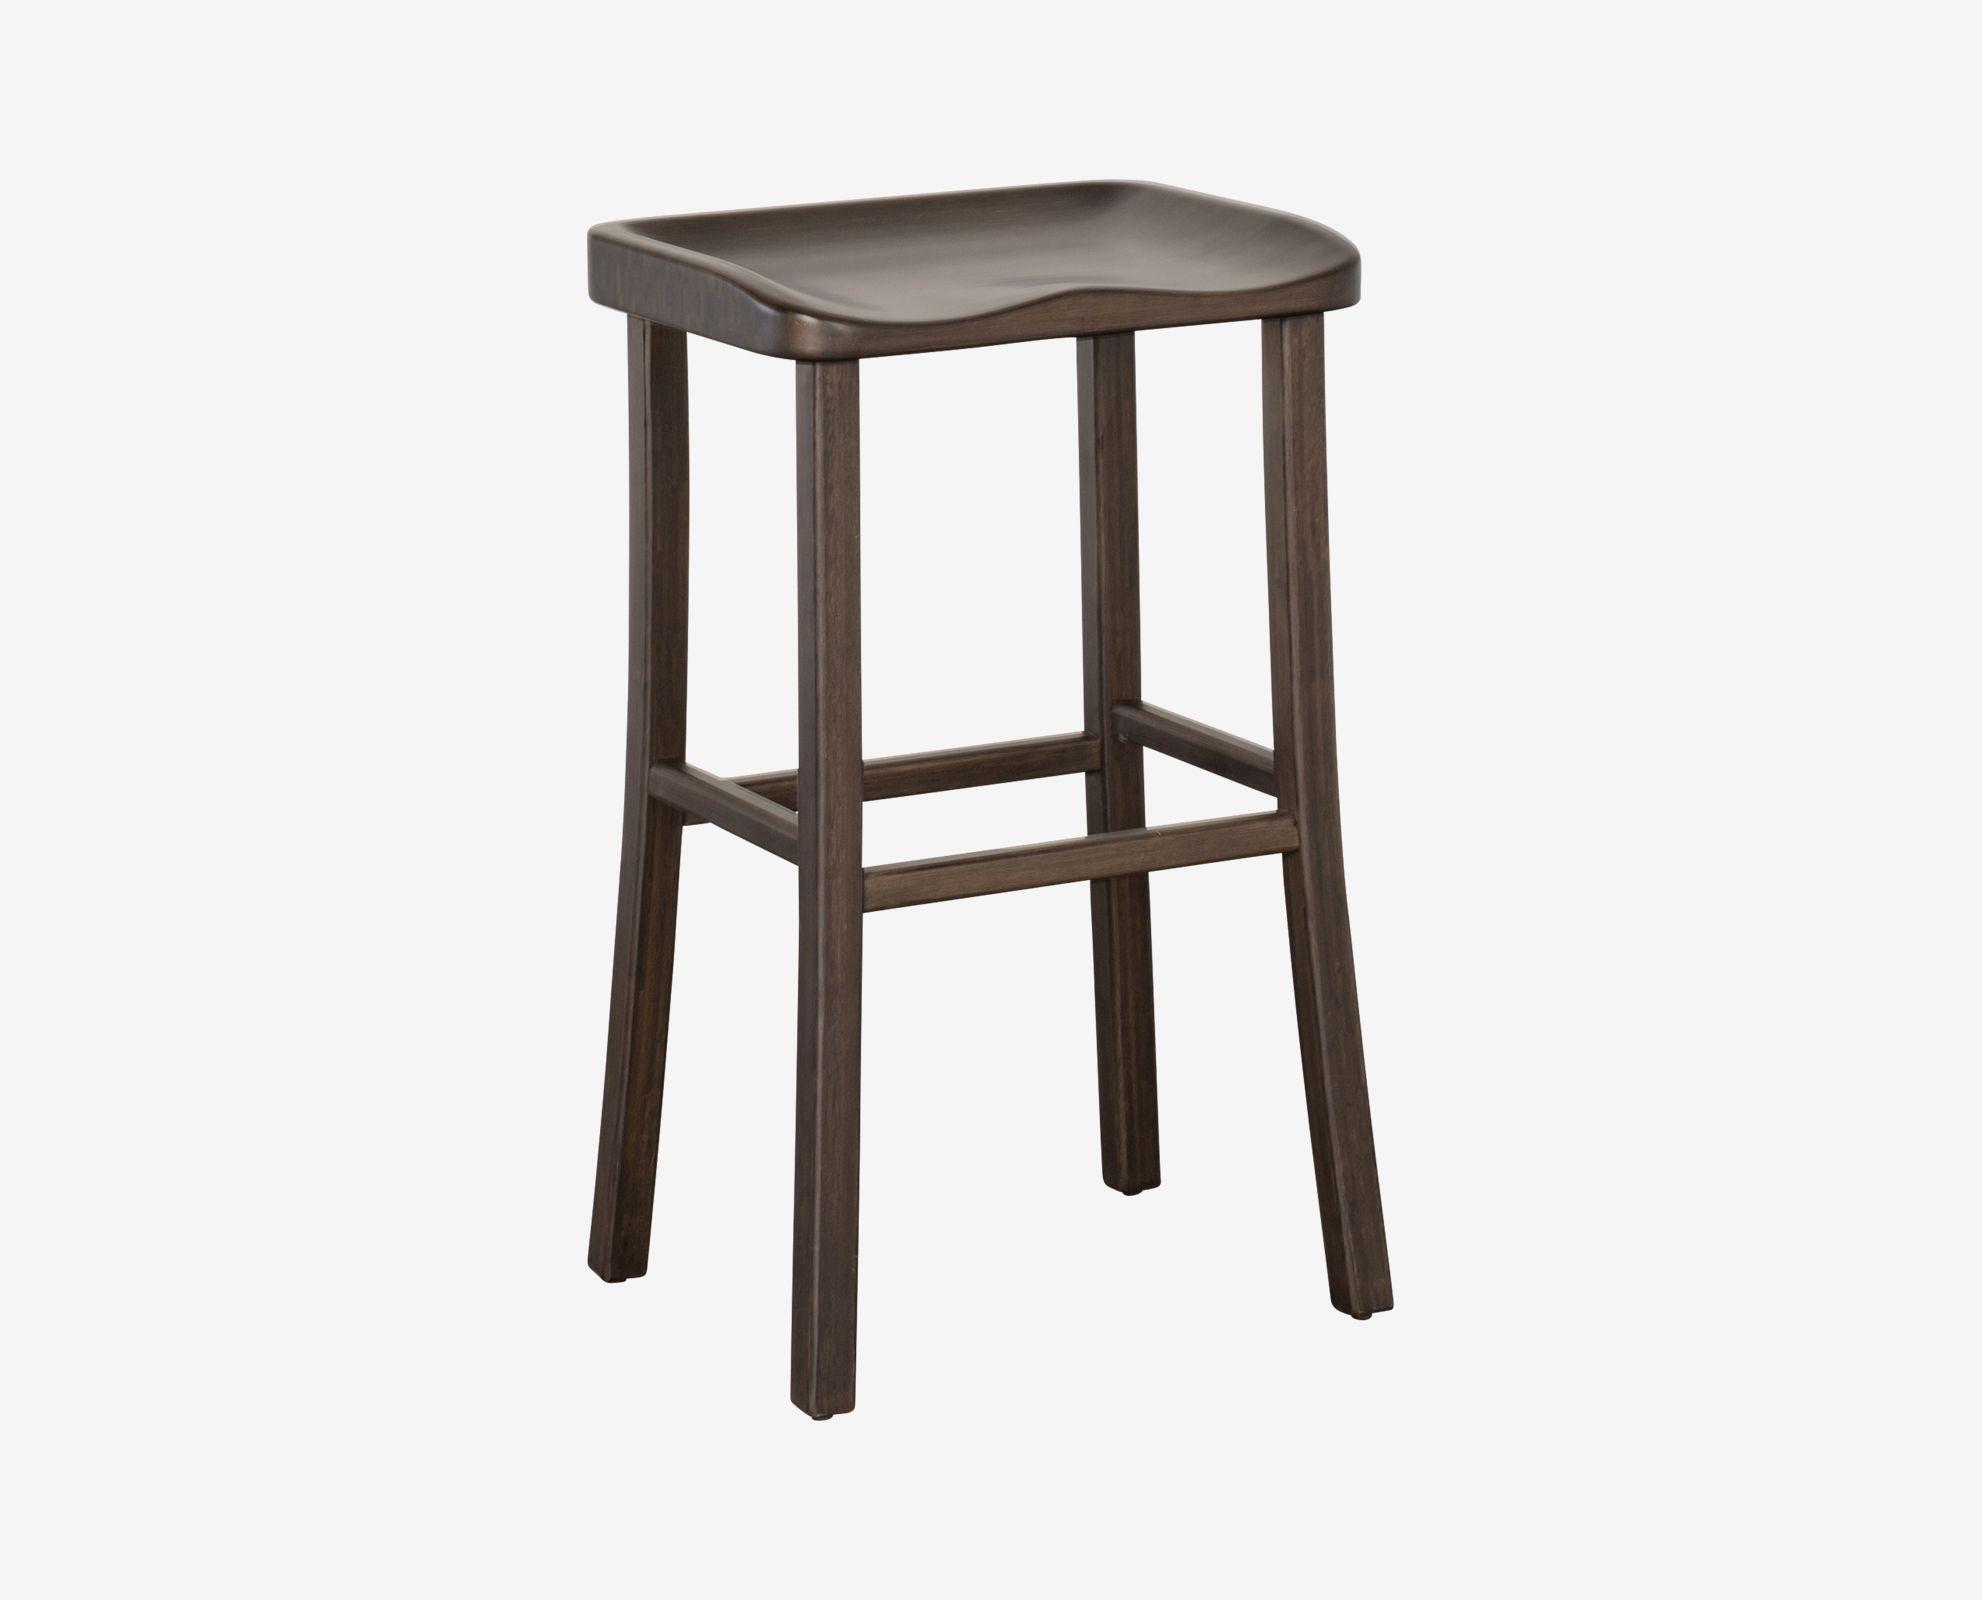 Scandinavian Designs Bar Stools Contemporary Home Furniture Scandinavian Design